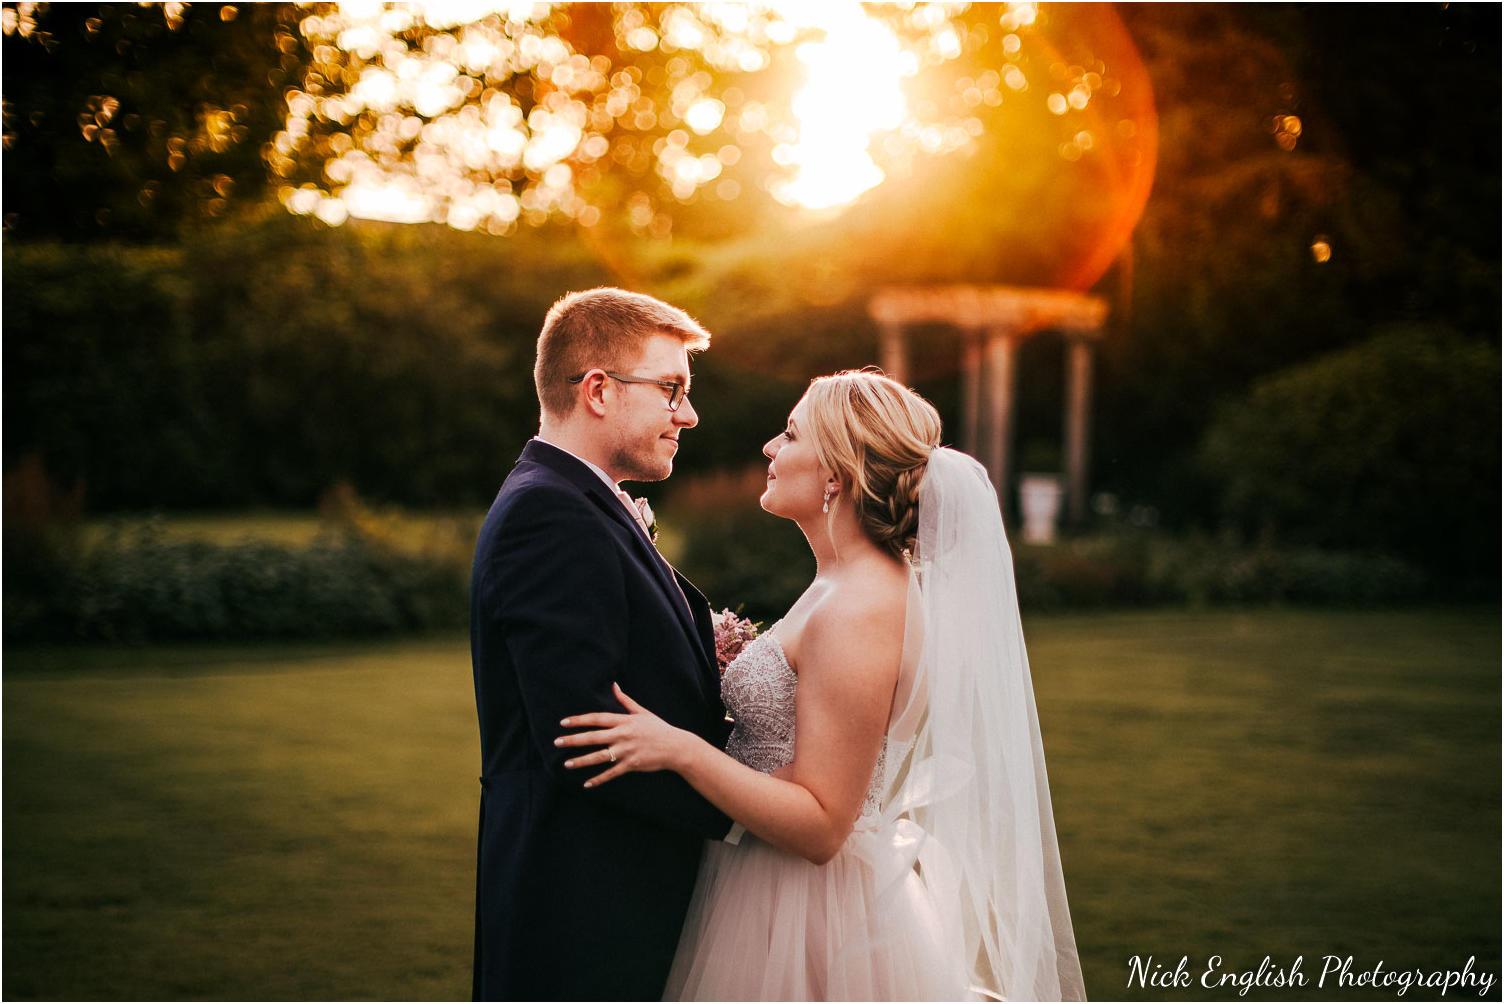 Eaves_Hall_Wedding_Photographer-98.jpg